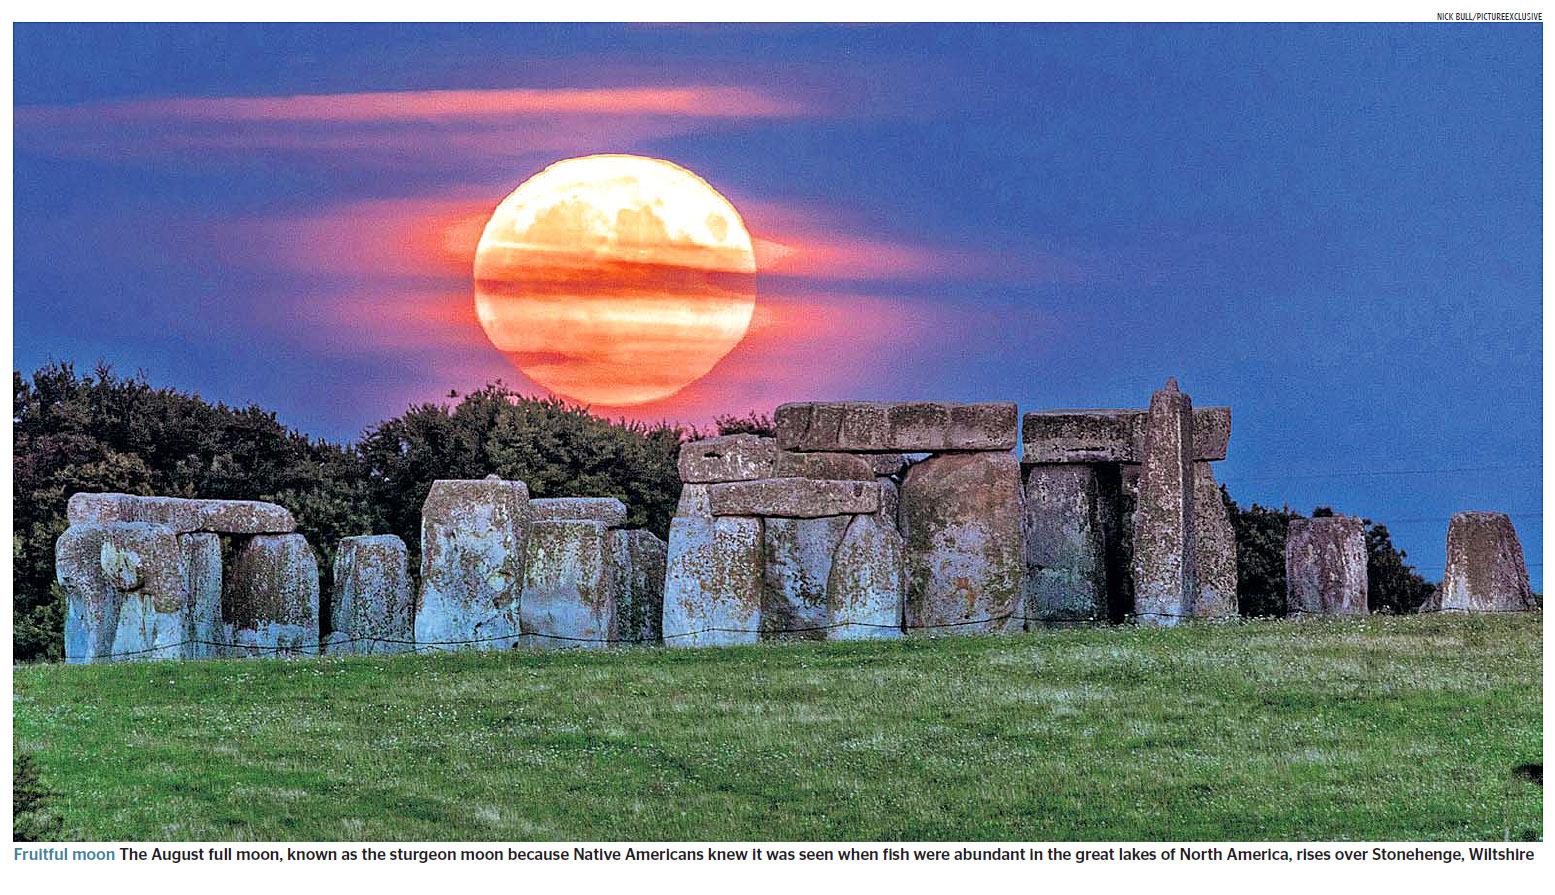 Moon over Stonehenge by Nick Bull.jpg